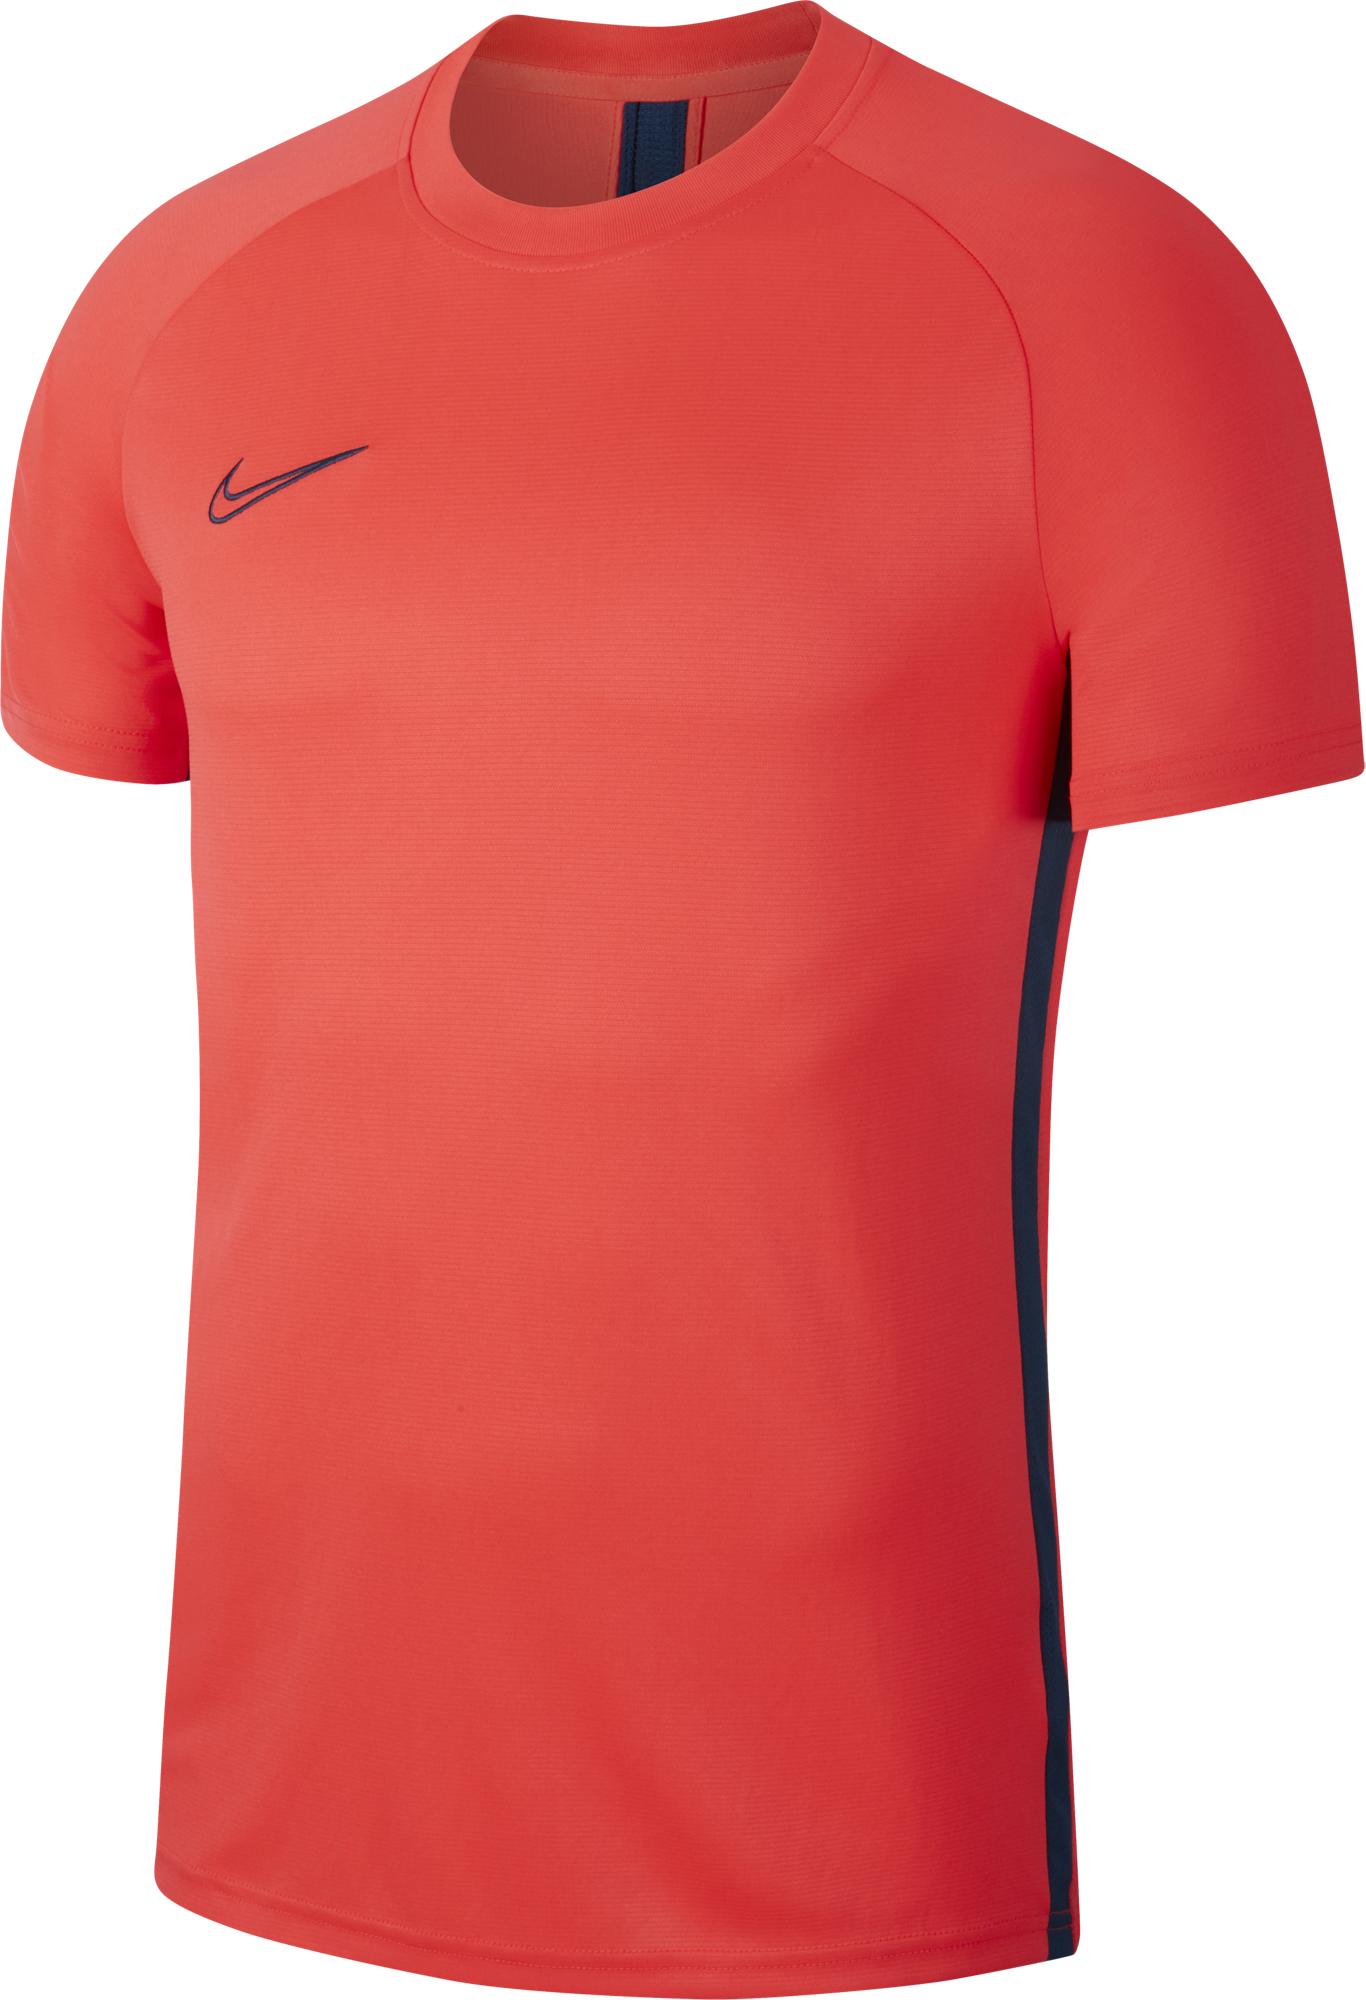 цена на Nike Футболка мужская Nike Dri-FIT Academy, размер 46-48